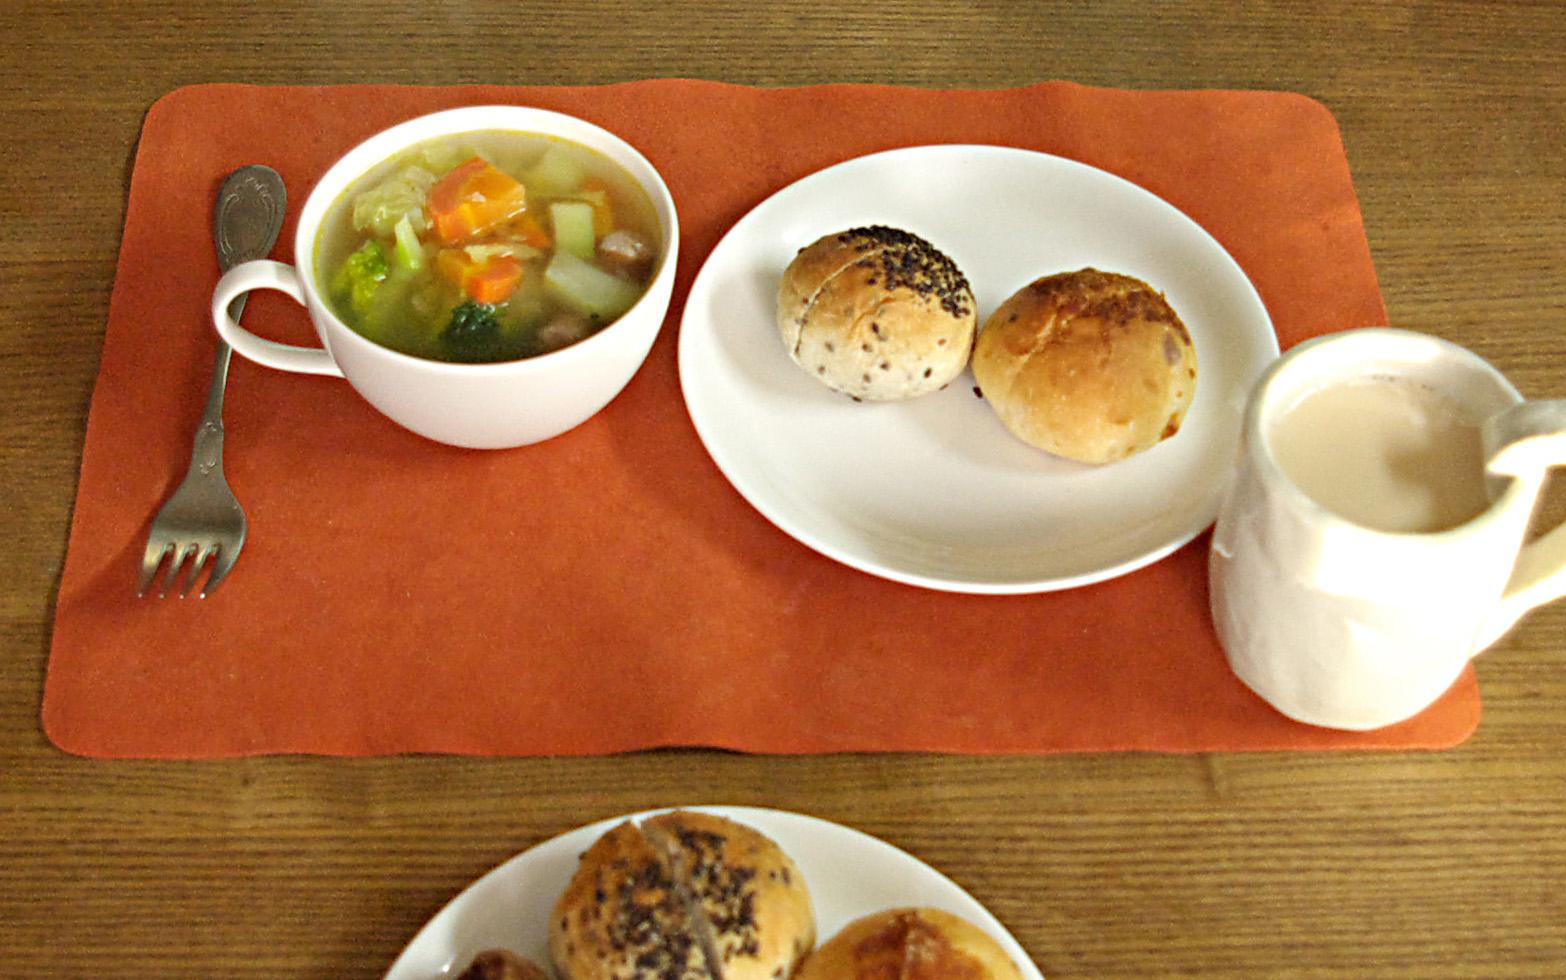 http://www.karimoku.co.jp/blog/kidsinterior/Breakfast.jpg